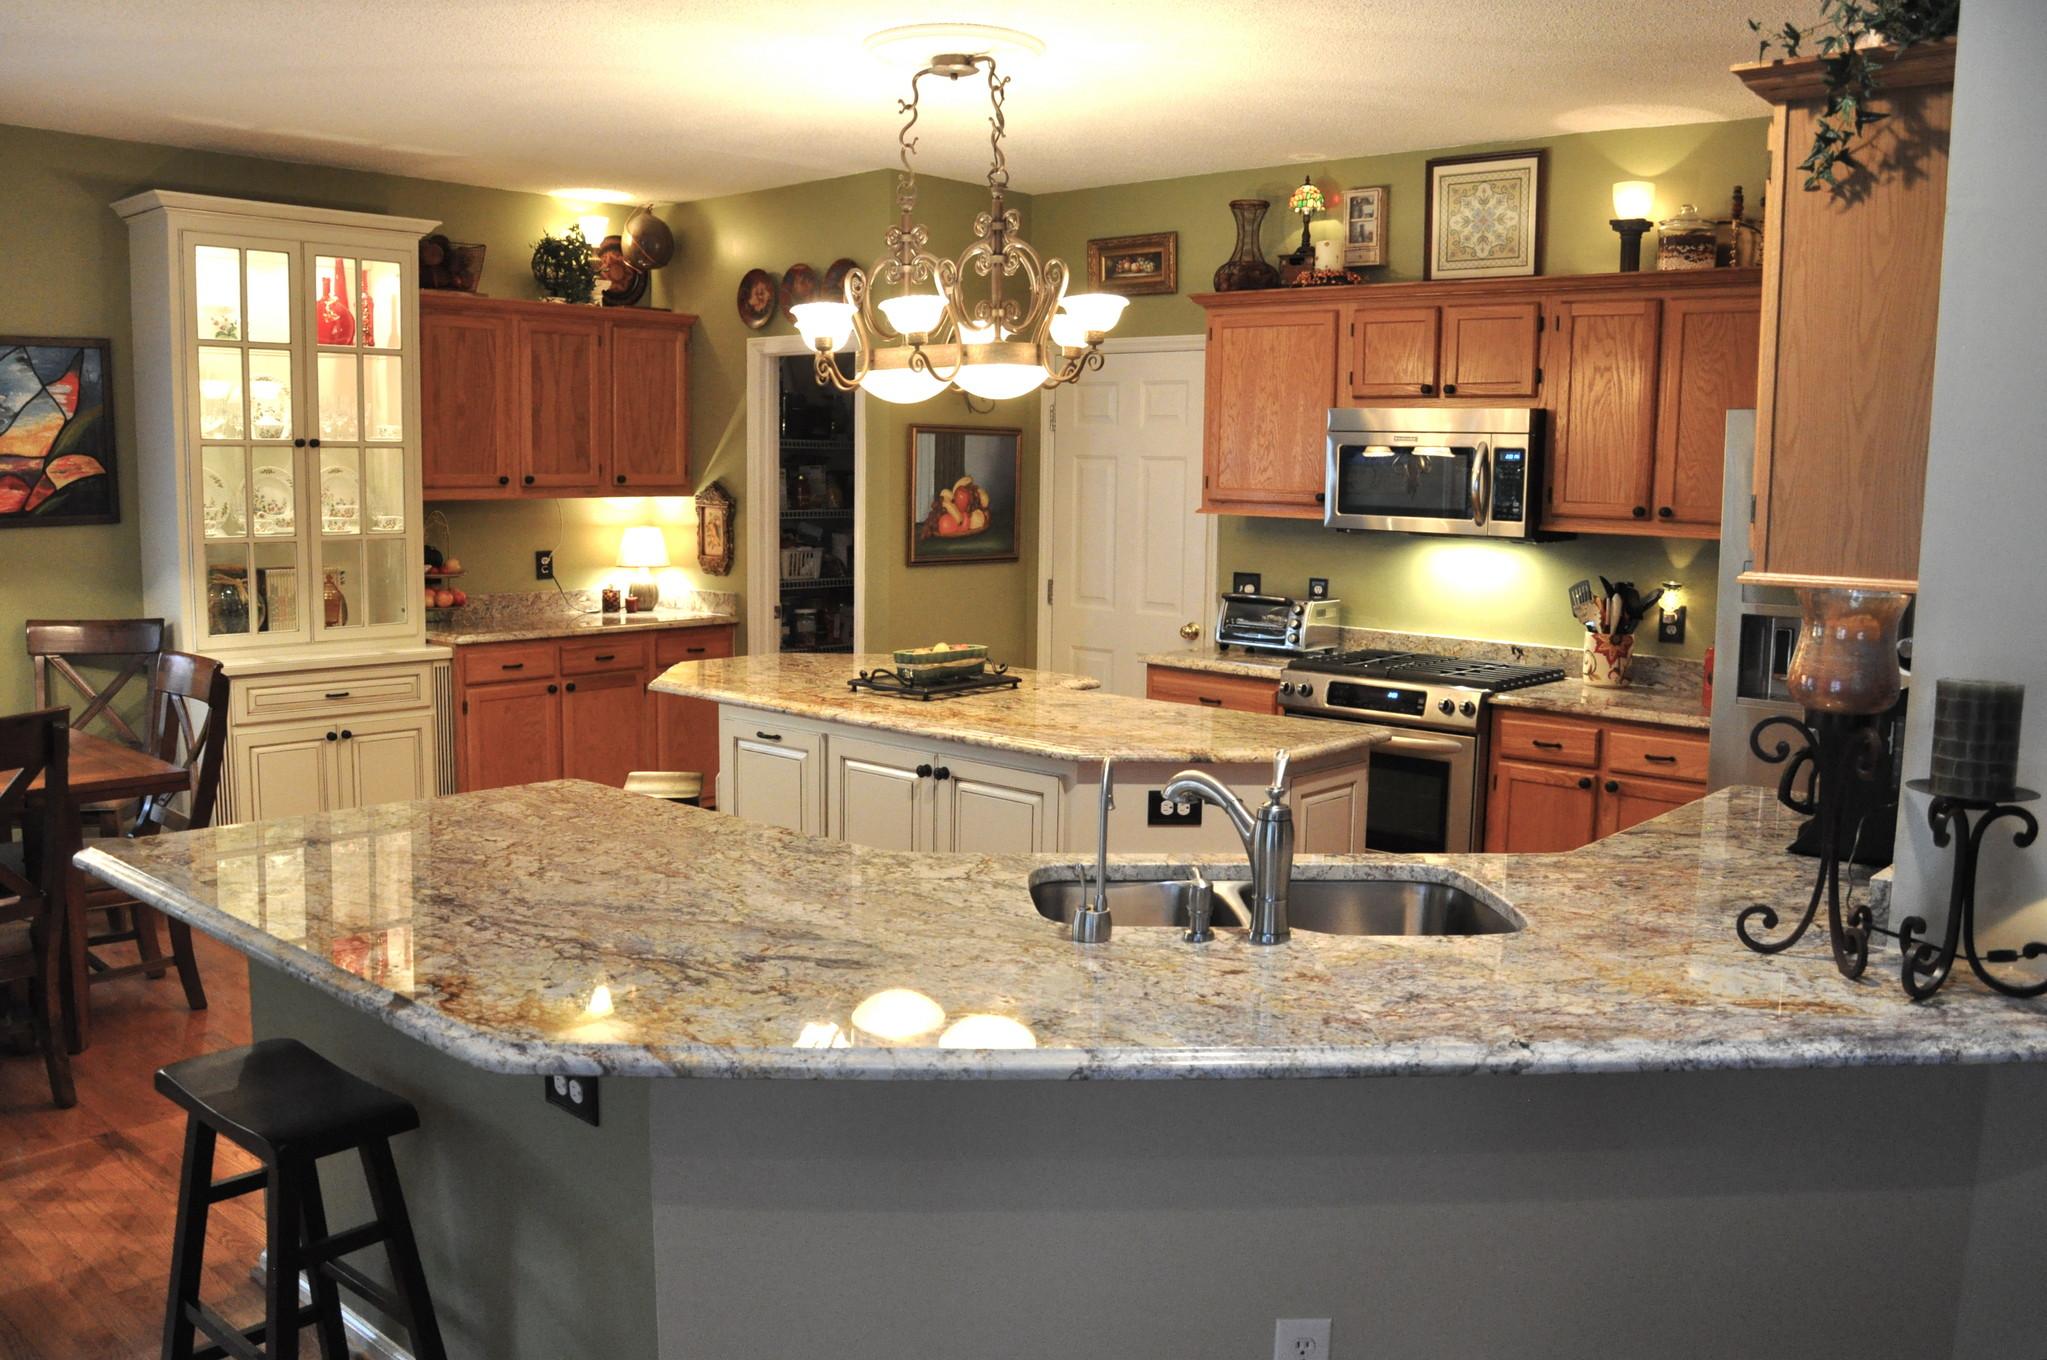 Kitchen Granite Countertop : Favorite types of granite countertops for stunning